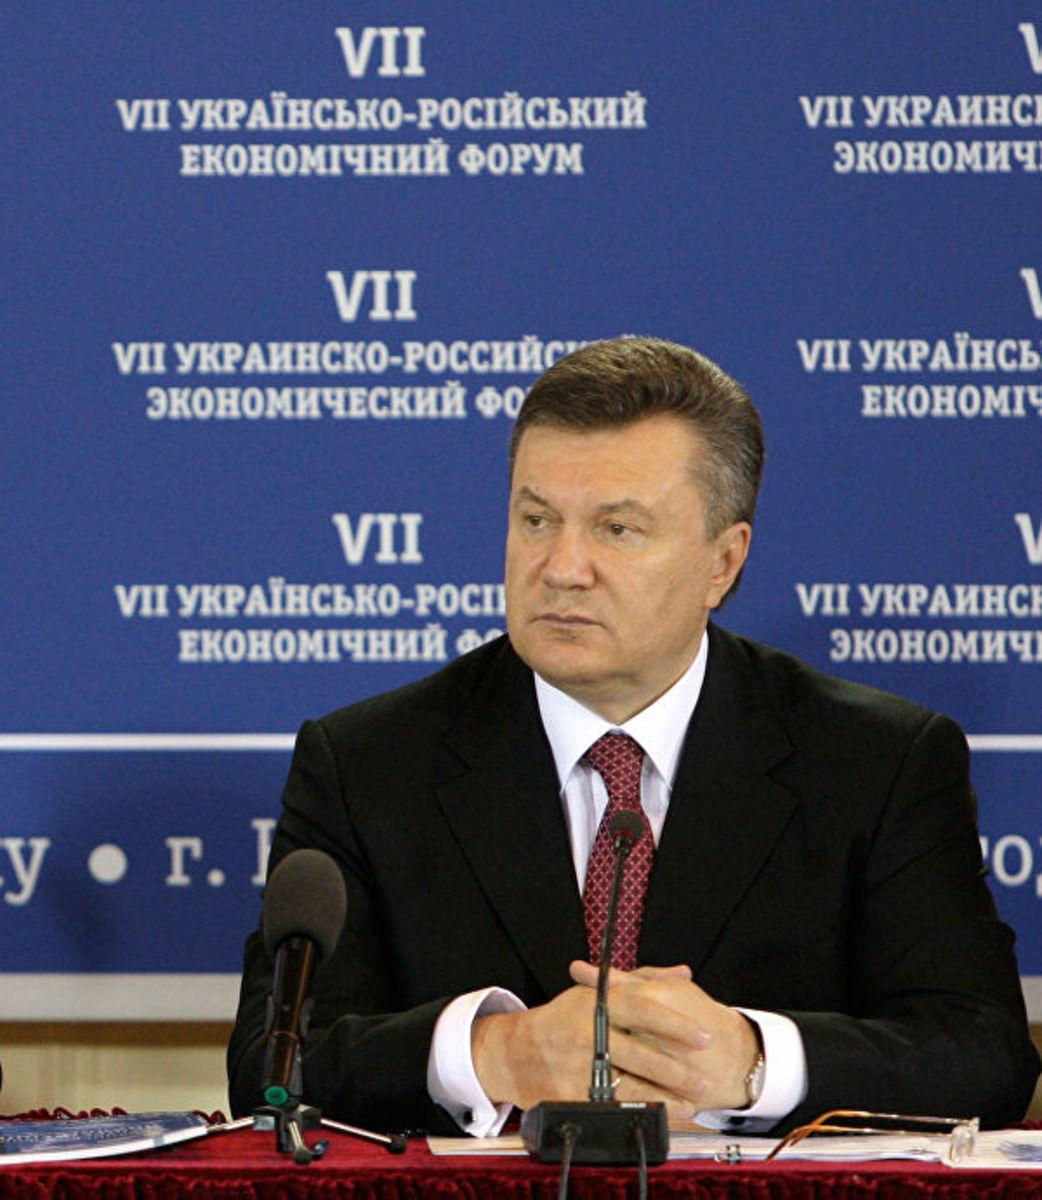 The President of Ukraine in 2014